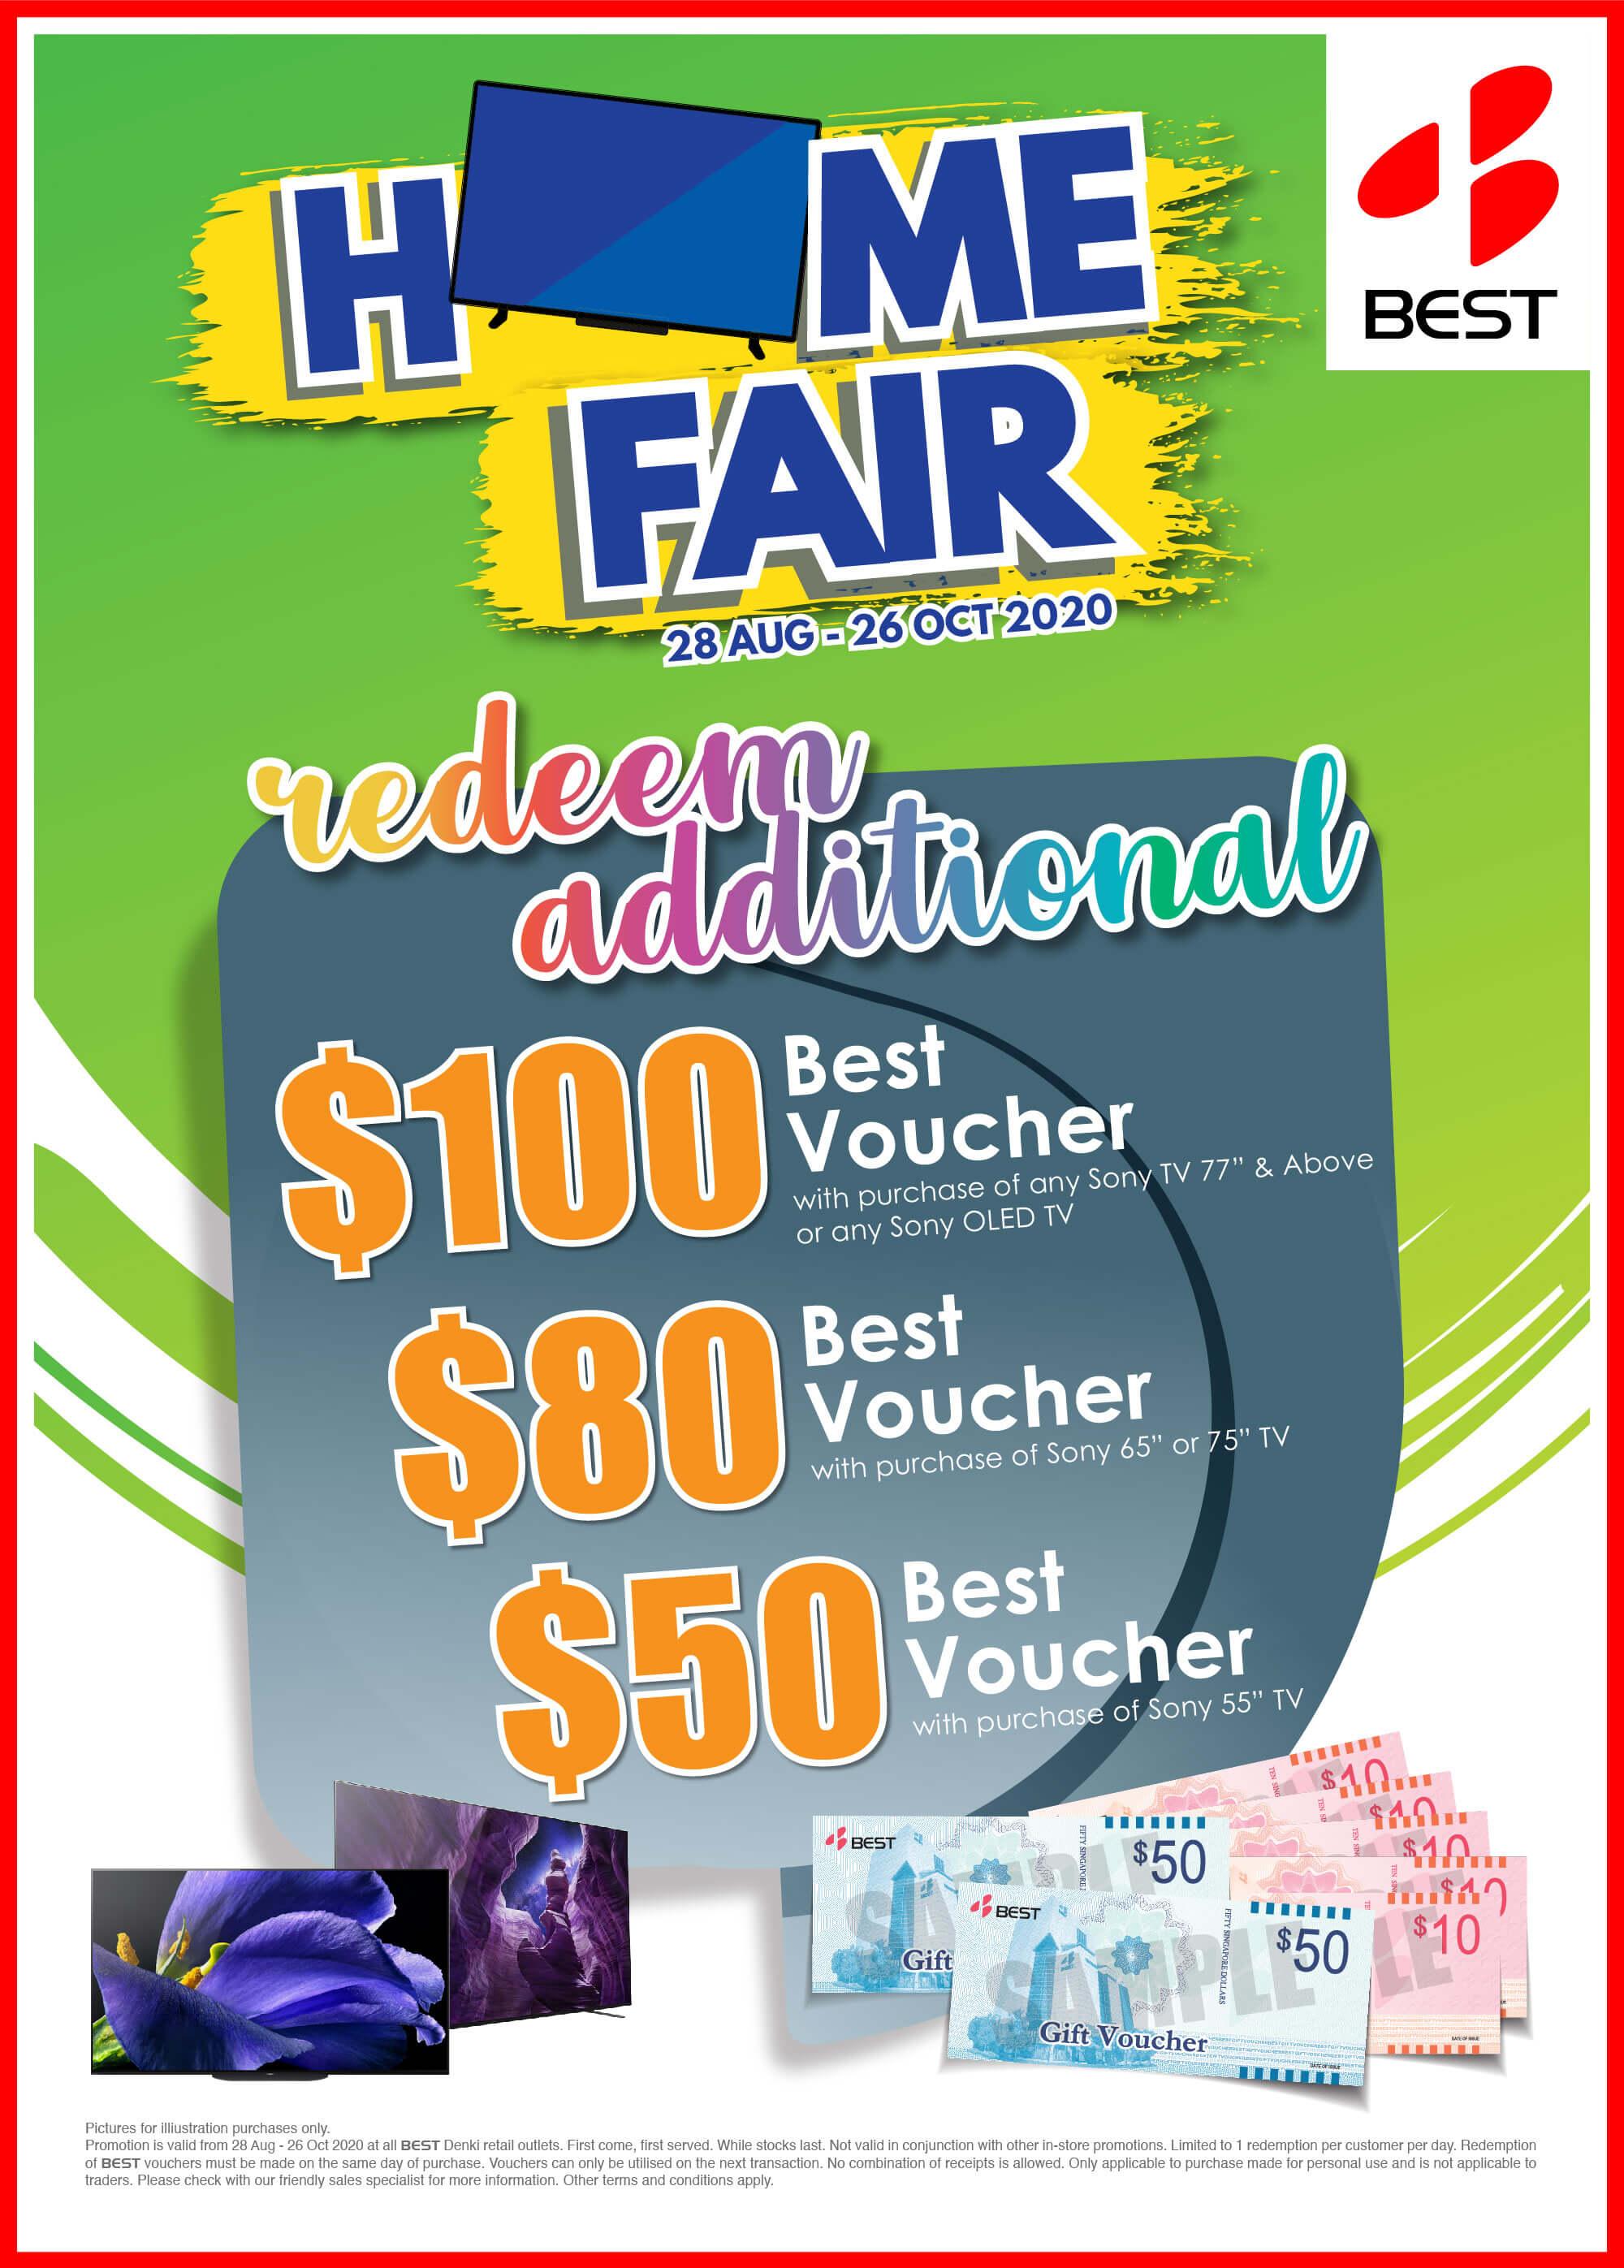 28 Aug to 26 Oct 2020: Best Denki Home Fair Redeem up to $100 Additional Best Vouchers